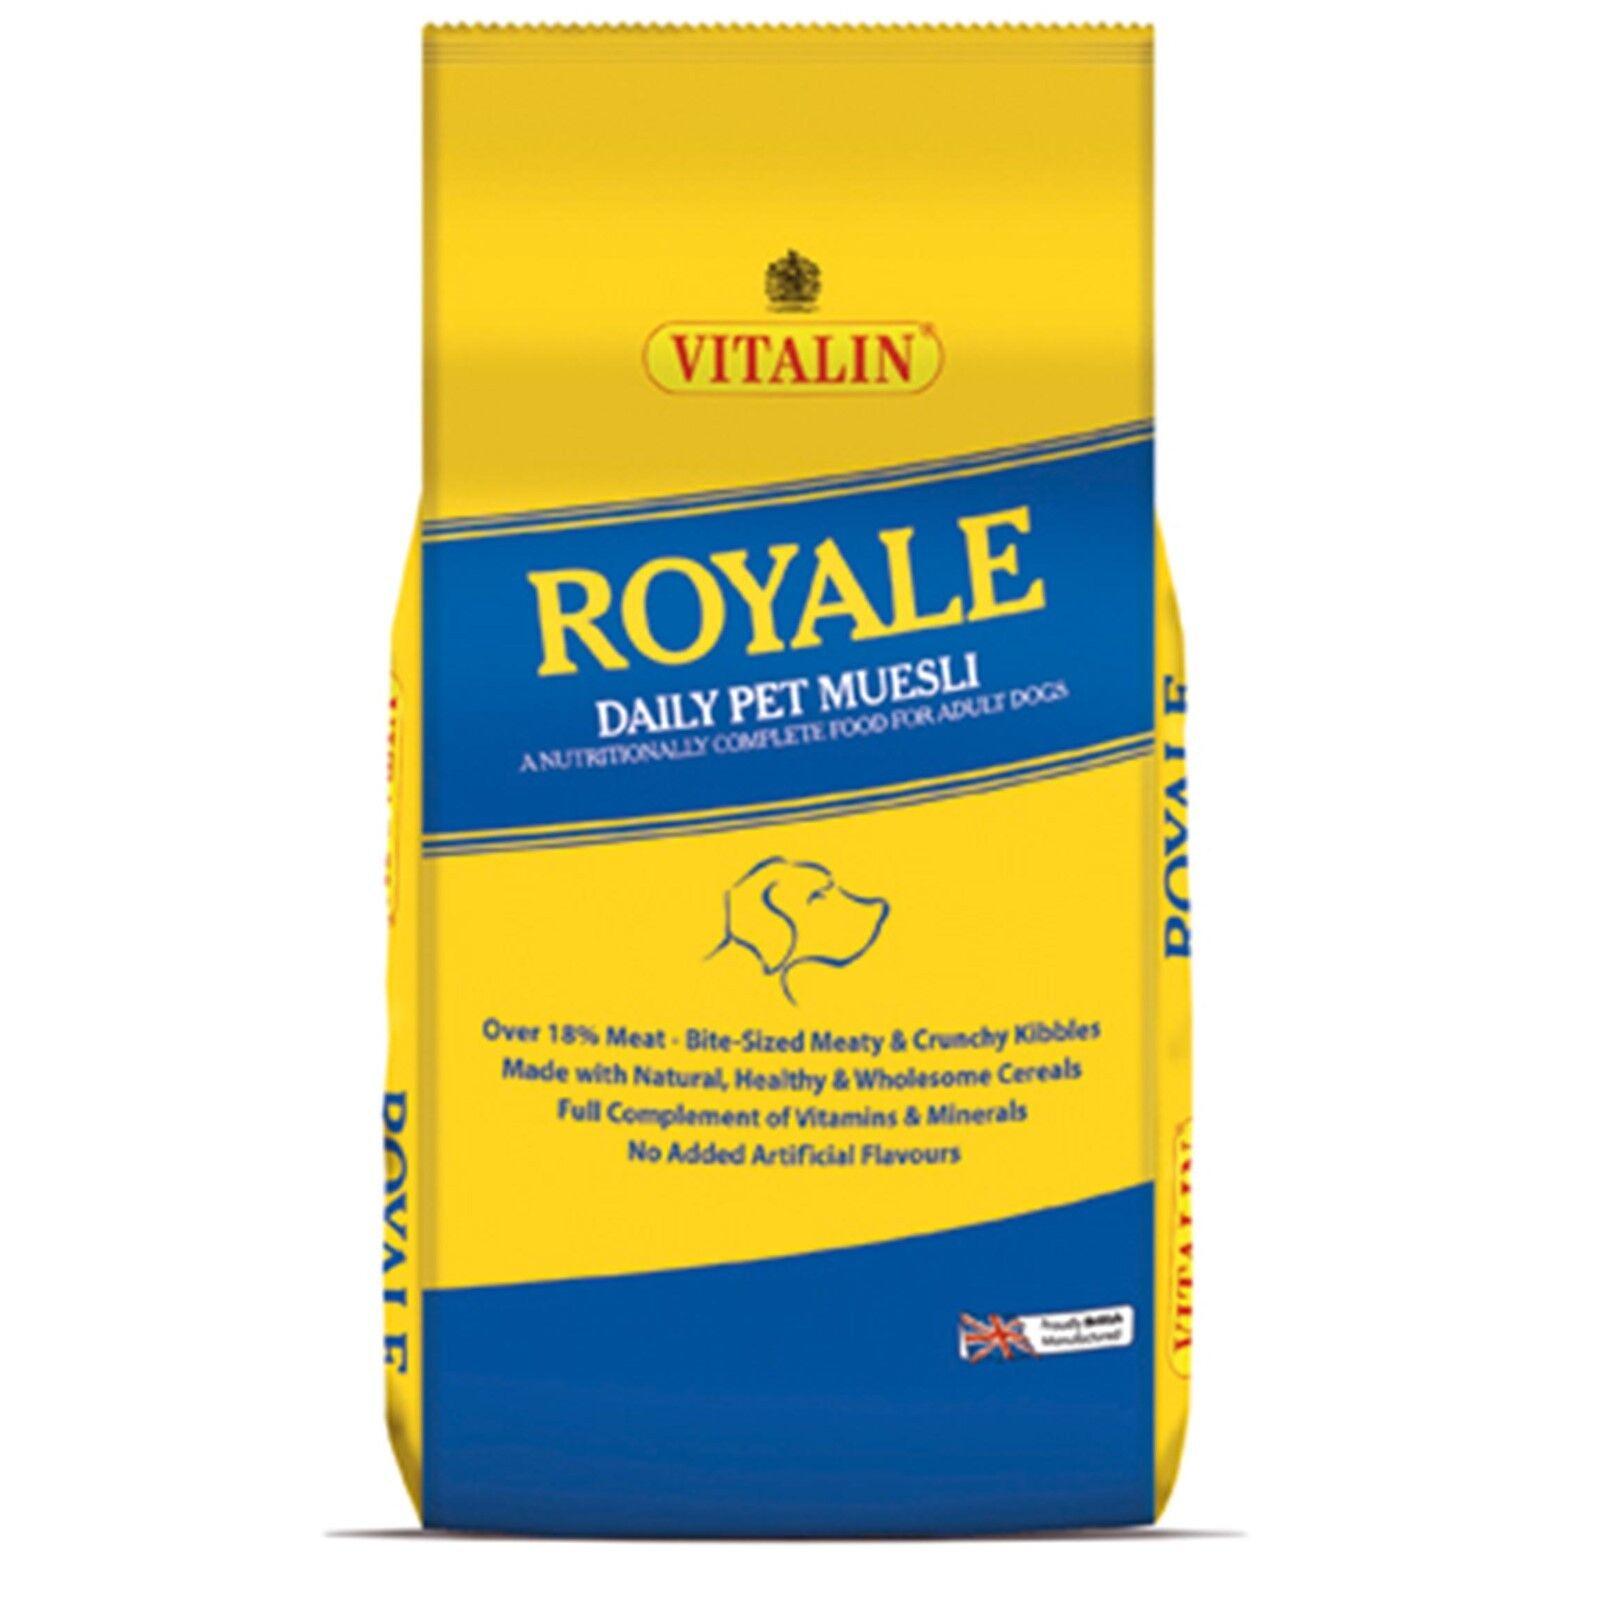 2 x 15kg (30kg) VITALIN ROYALE CRUNCHY MUESLI MIX - COMPLETE DRY MIXED DOG FOOD